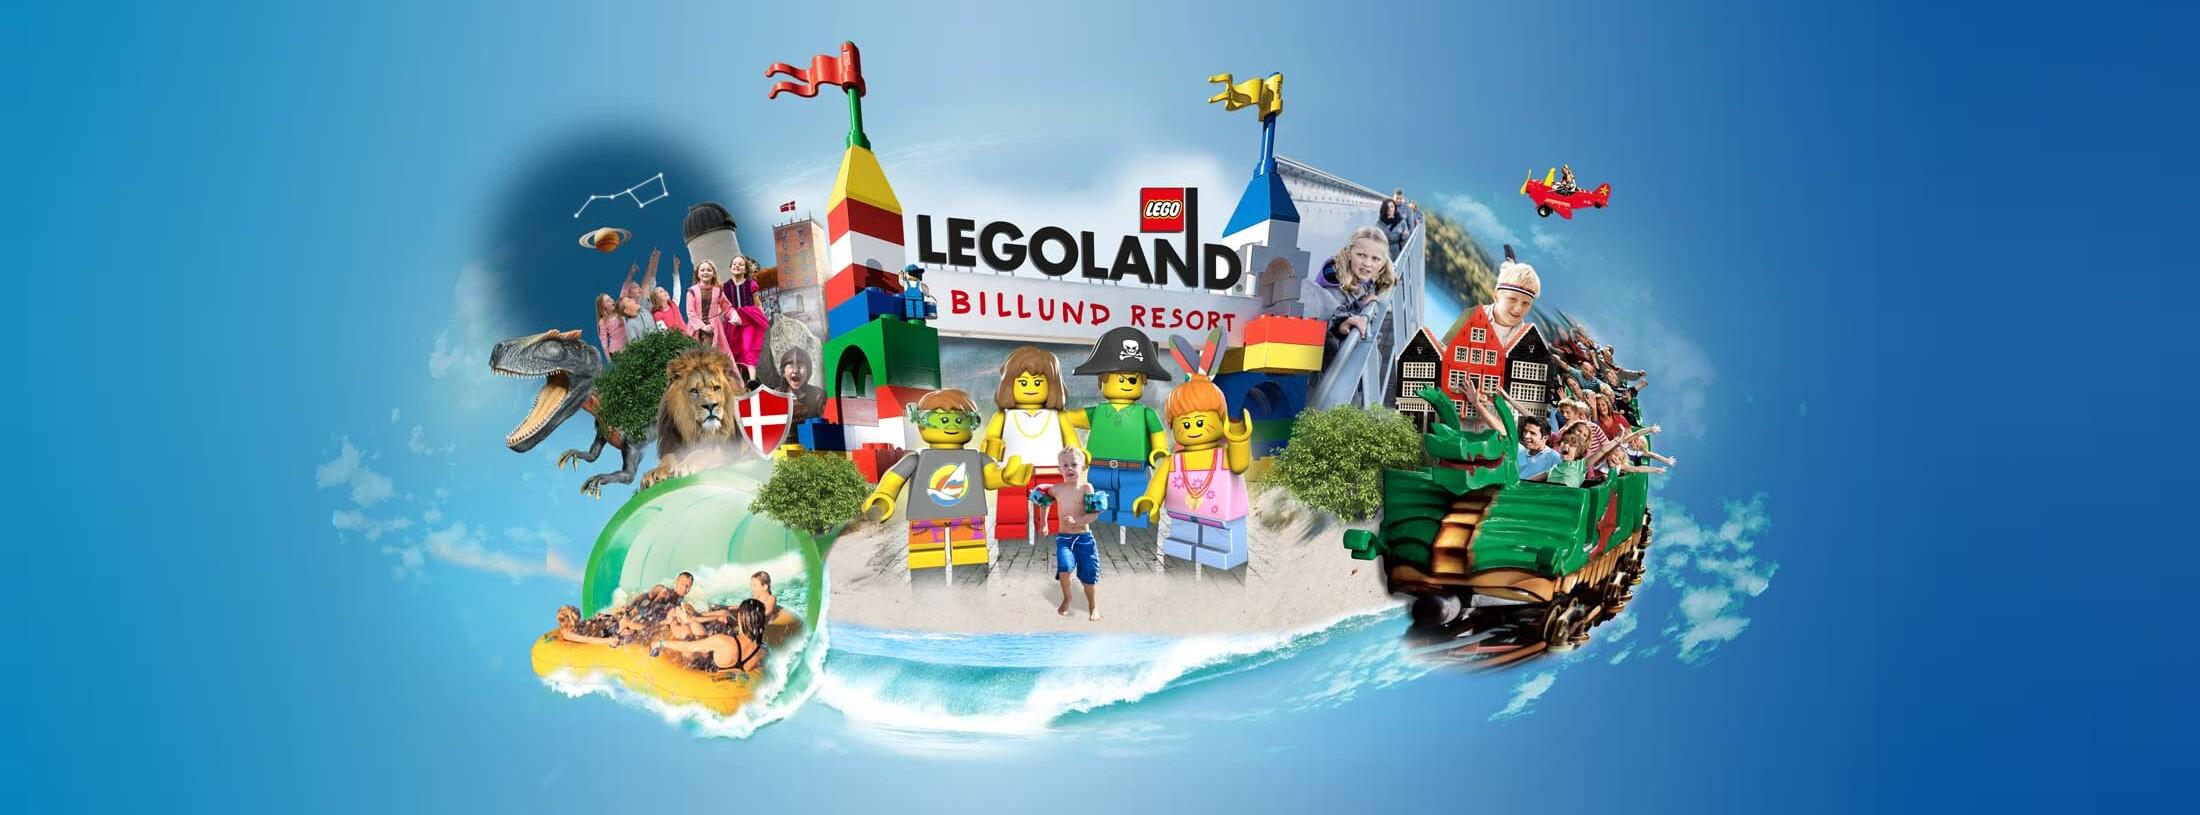 LEGOLAND® Billund